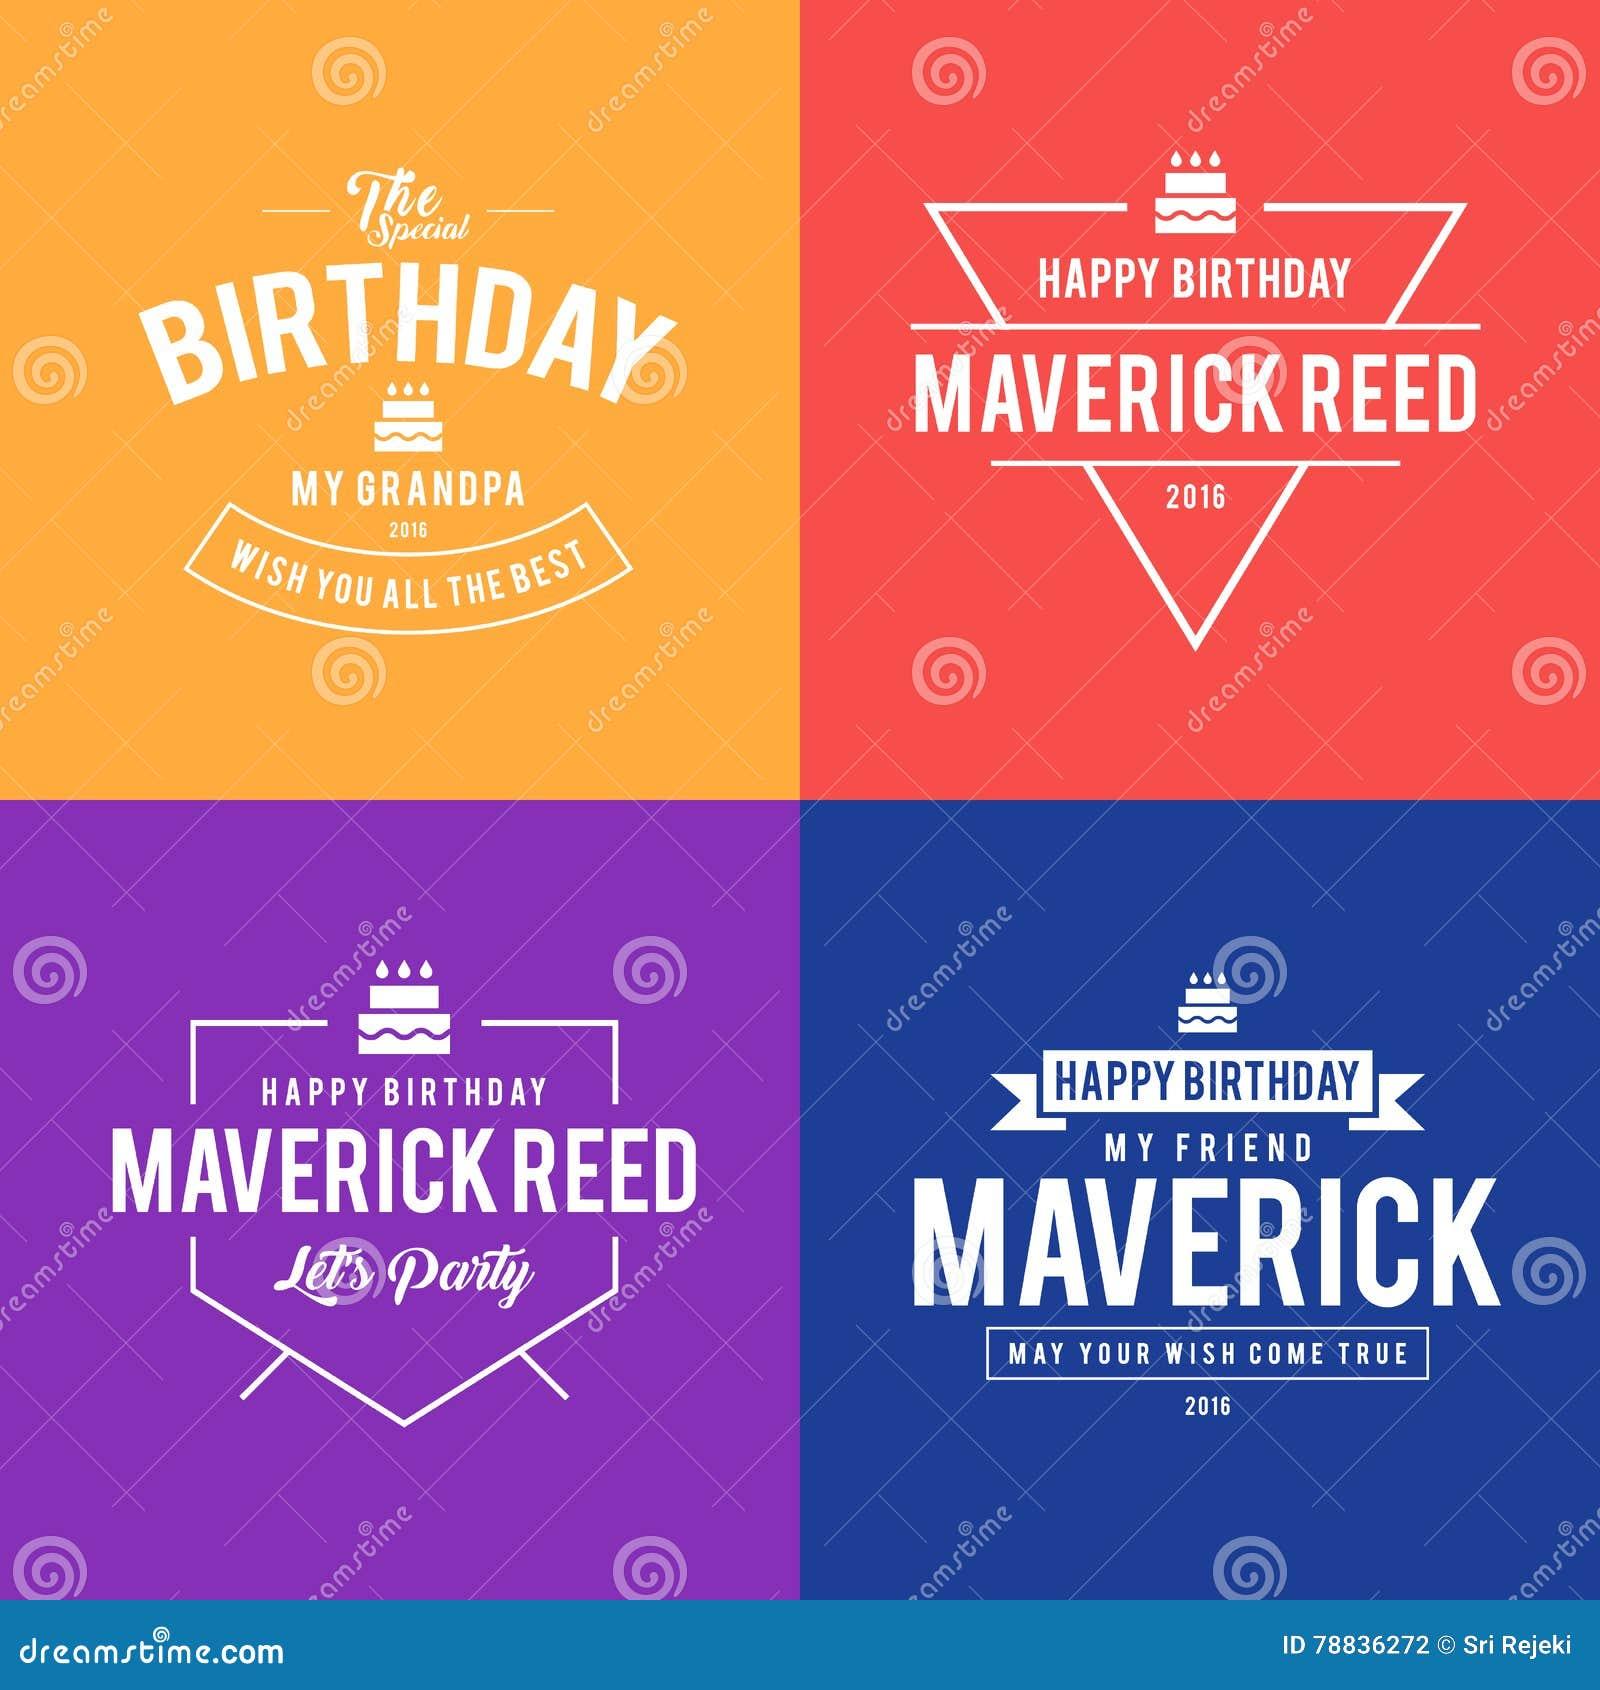 Elegant retro birthday greetings design concept stock vector elegant retro birthday greetings design concept m4hsunfo